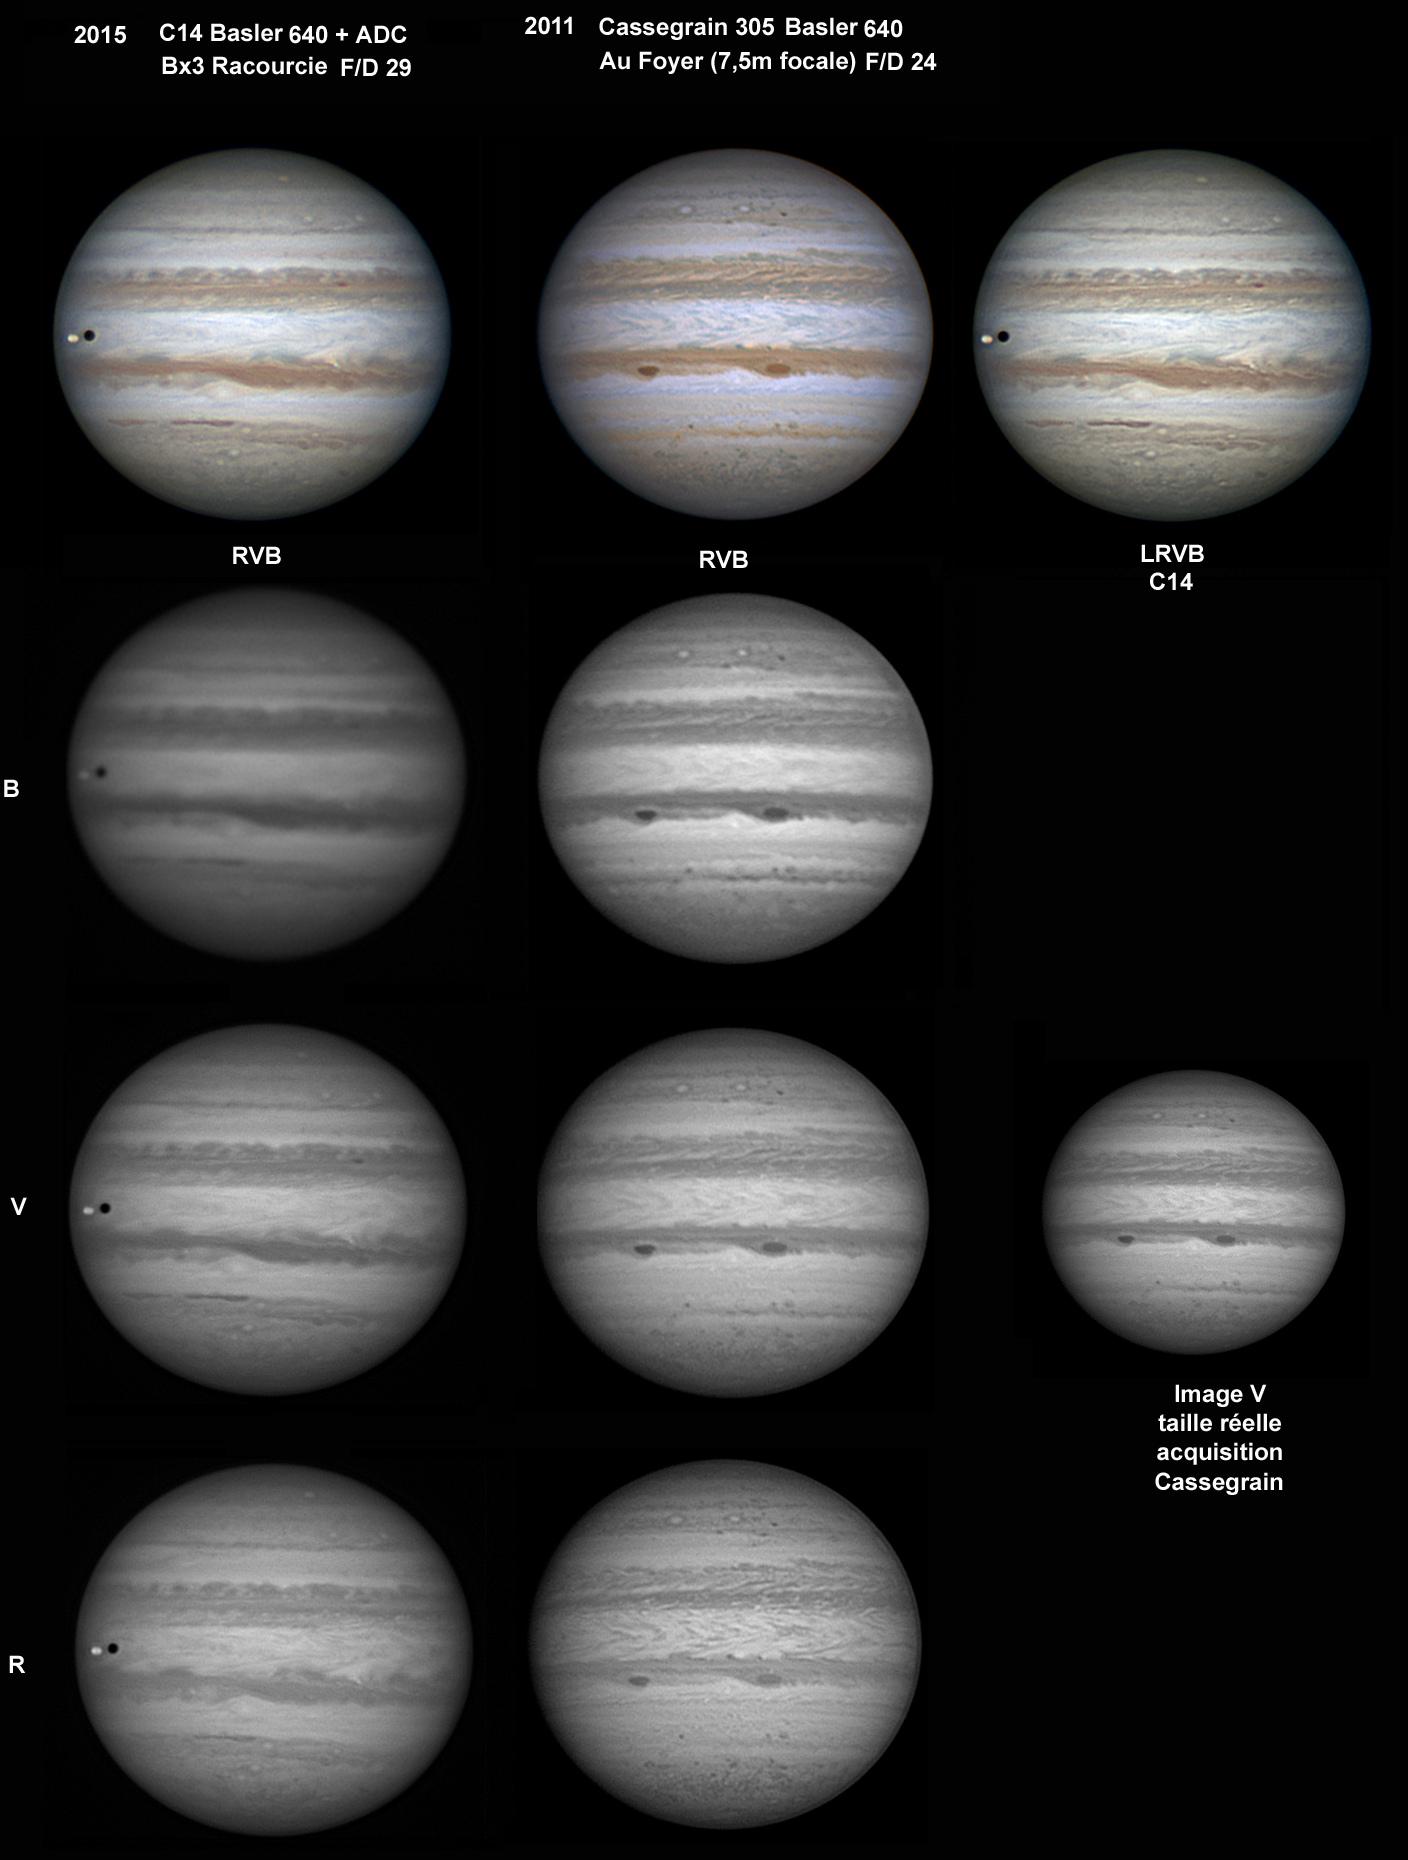 large.Comparaison-Jupi-C14-Casseg.jpg.5dc5127cc14a604bd41a451b4dc4ff89.jpg